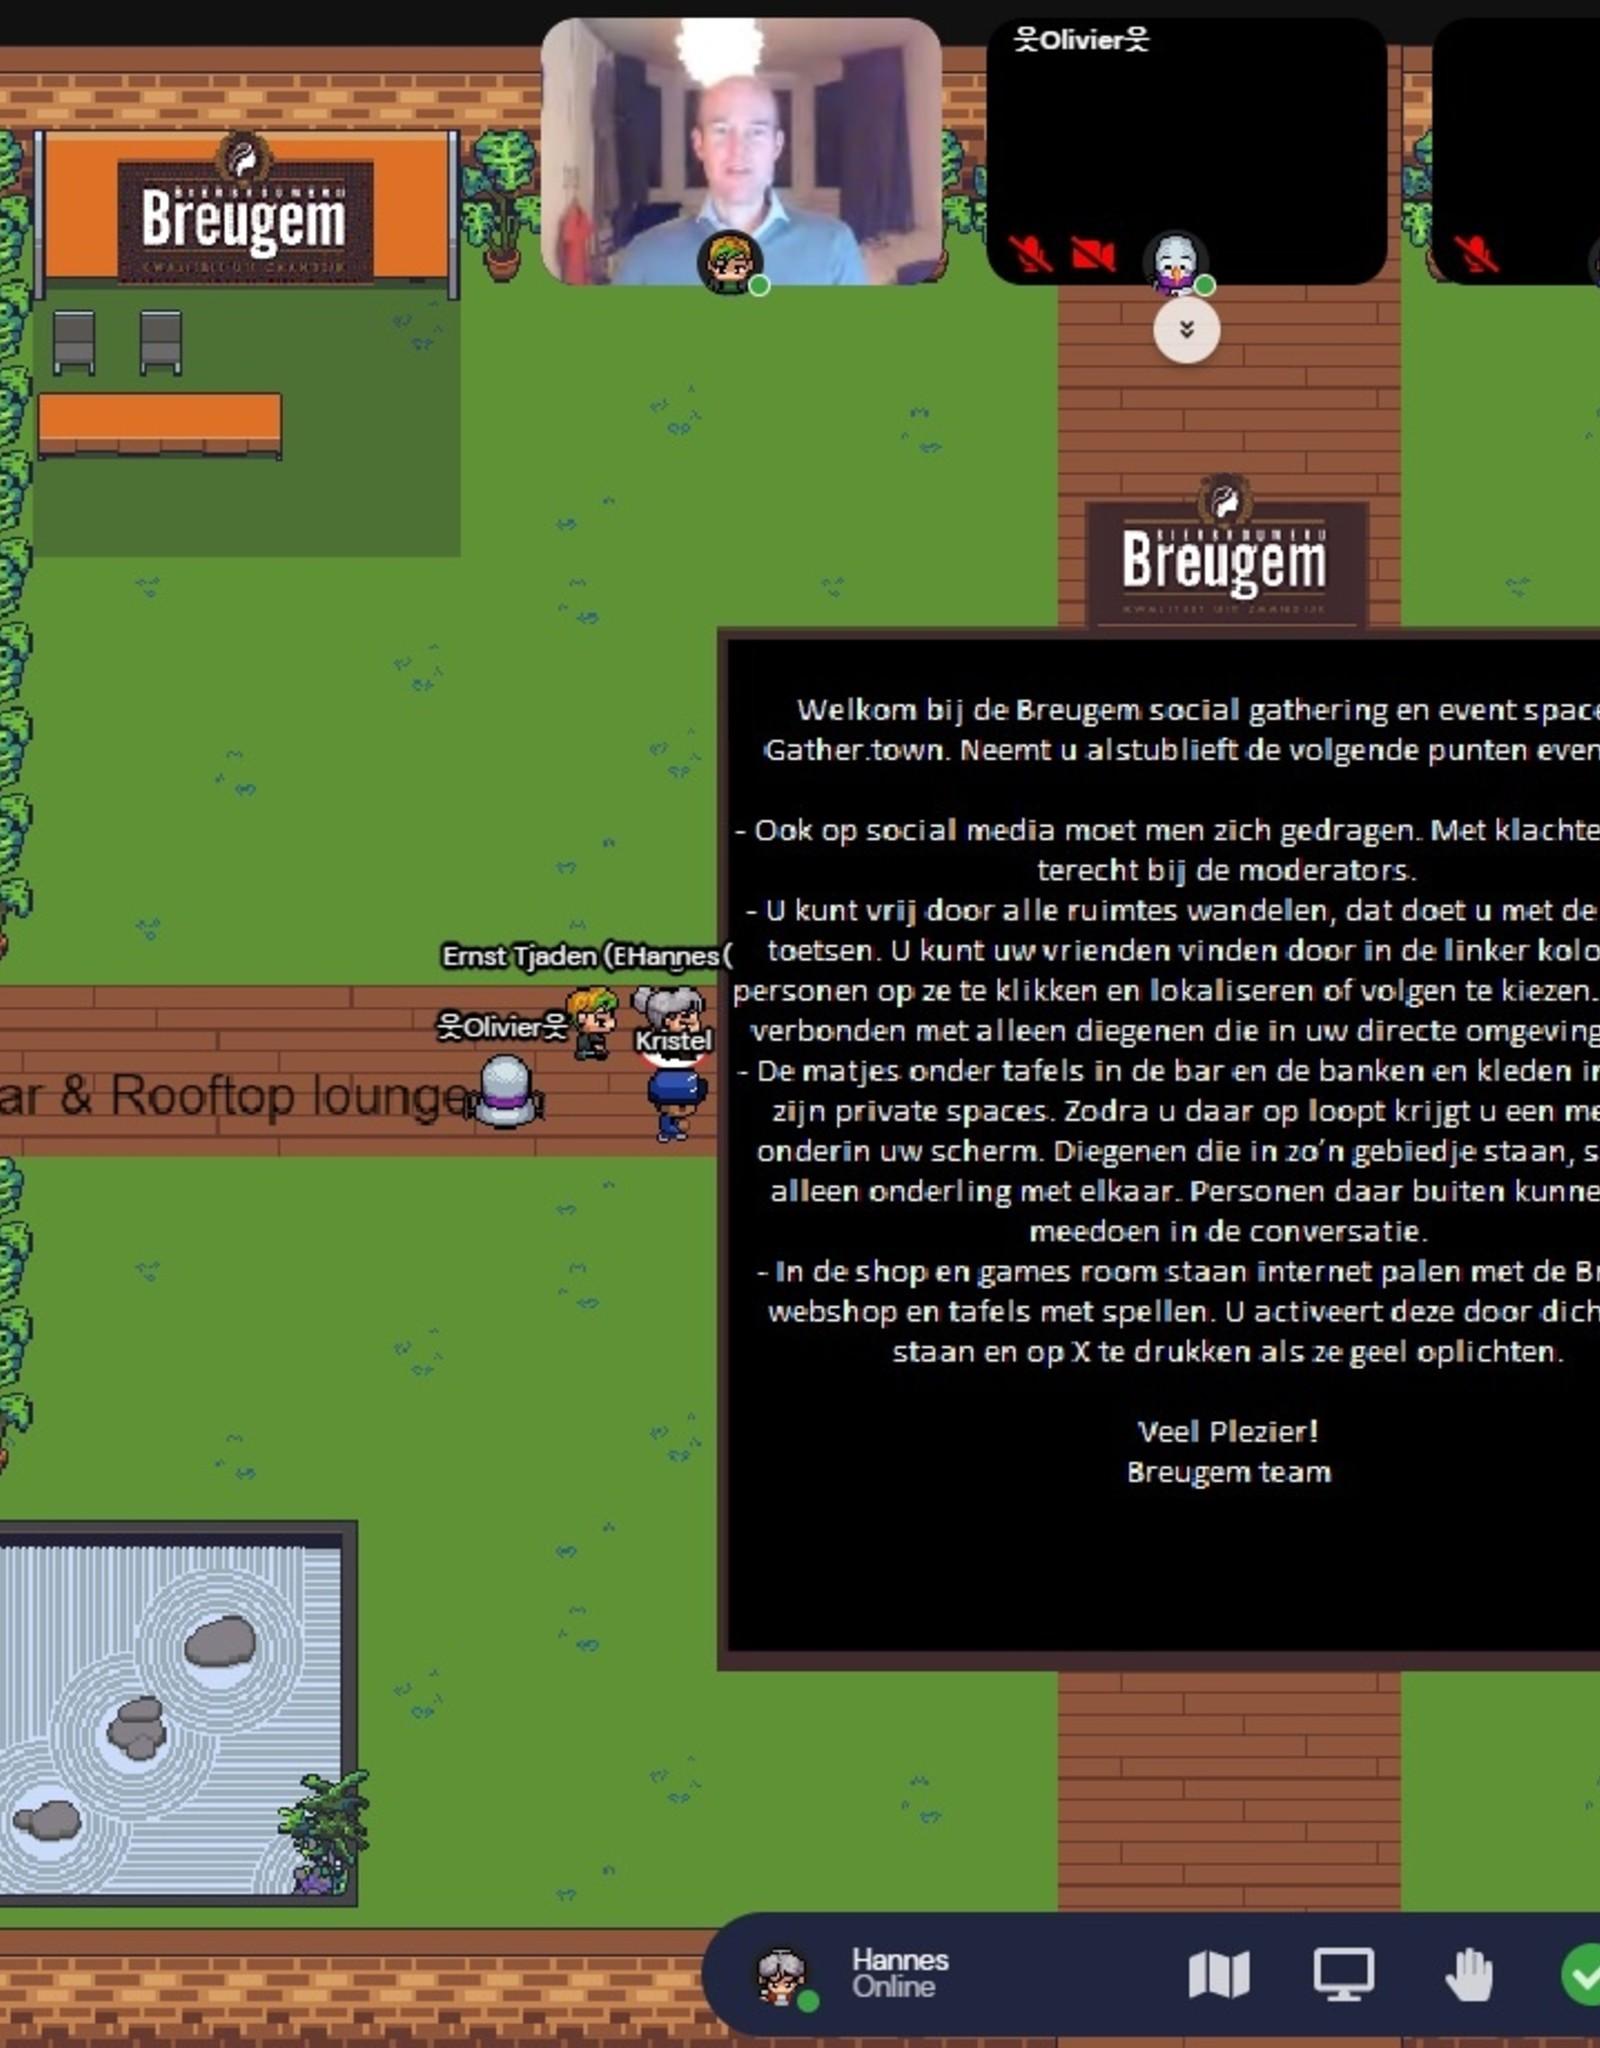 Concarne Breugem's Bar Box